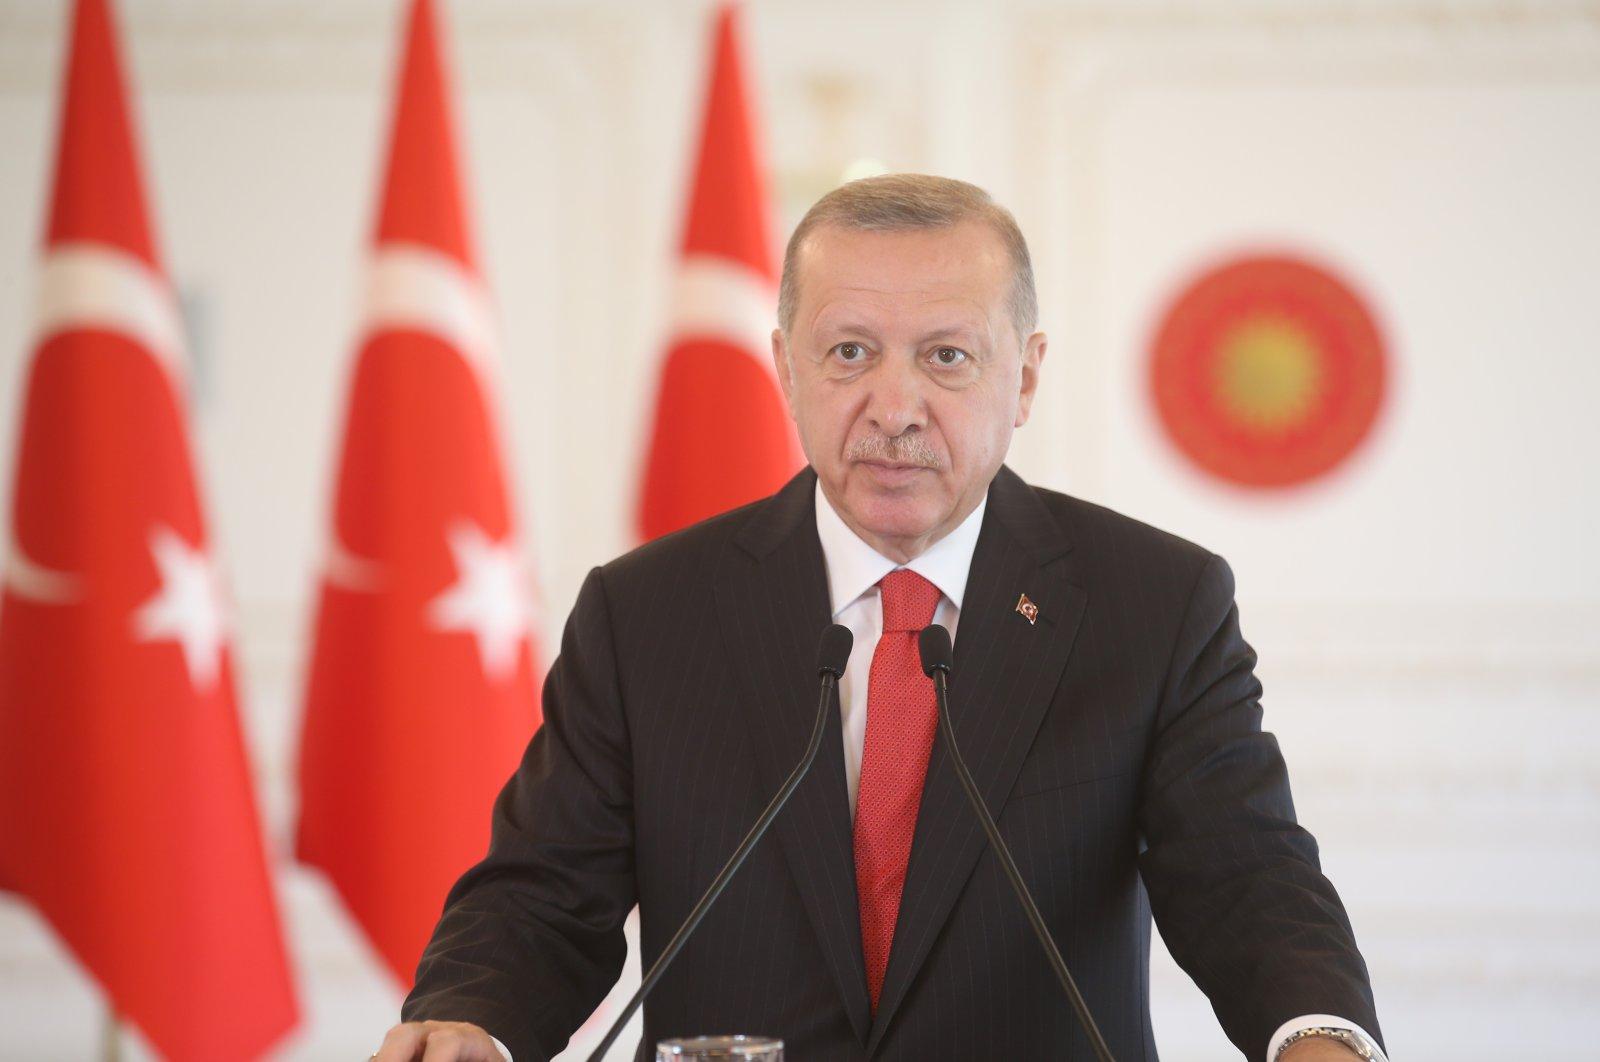 President Recep Tayyip Erdoğan speaks via video link during a mass launching ceremony of hydroelectric power plants, Istanbul, Turkey, July 5, 2020. (IHA Photo)